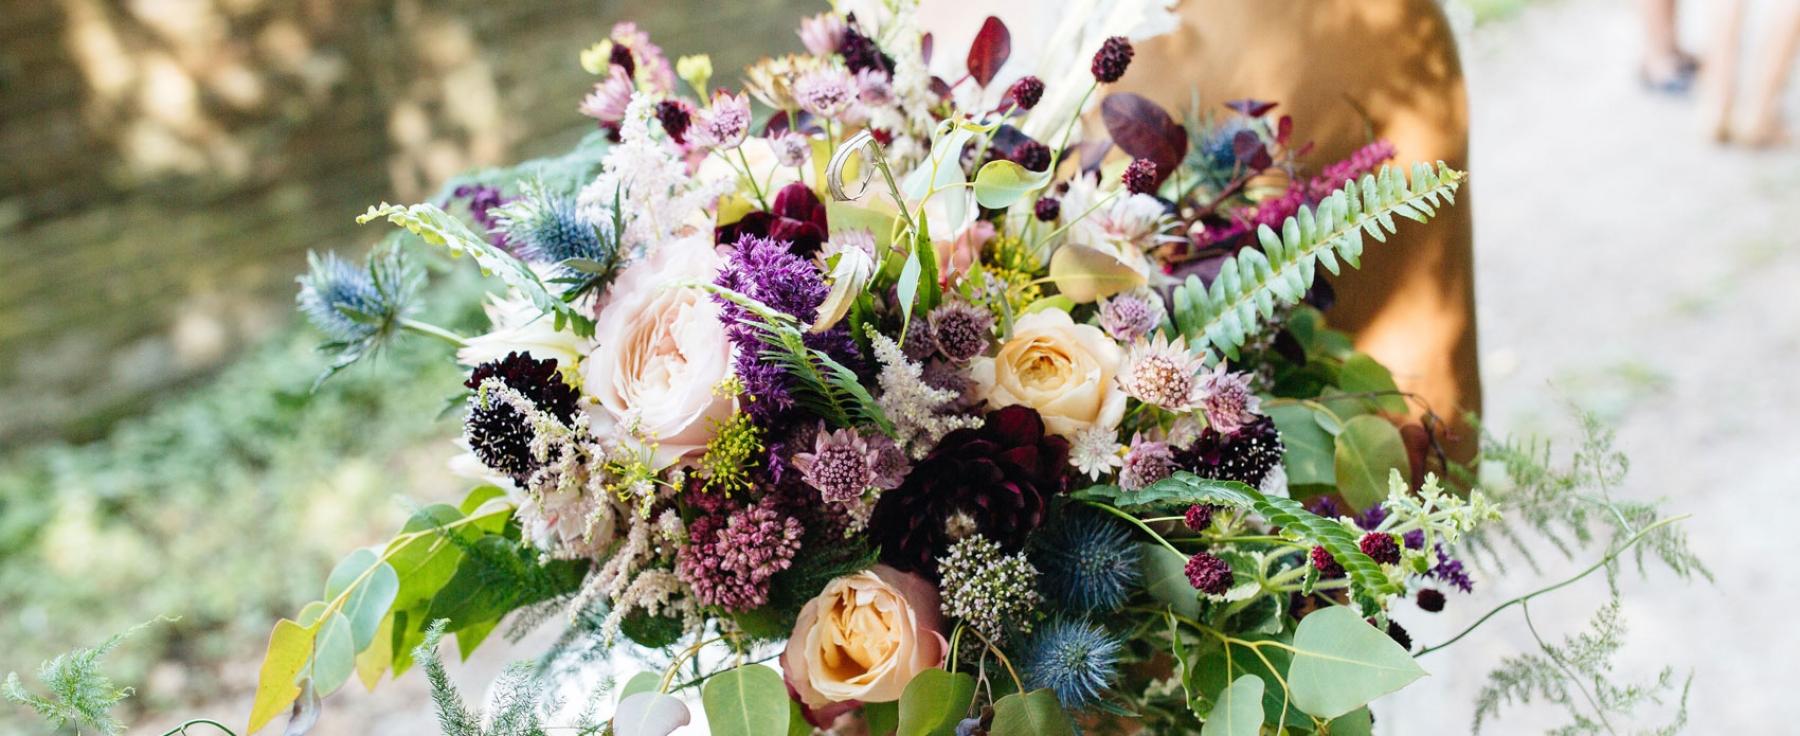 joanne-truby-wedding-florals-slide-10